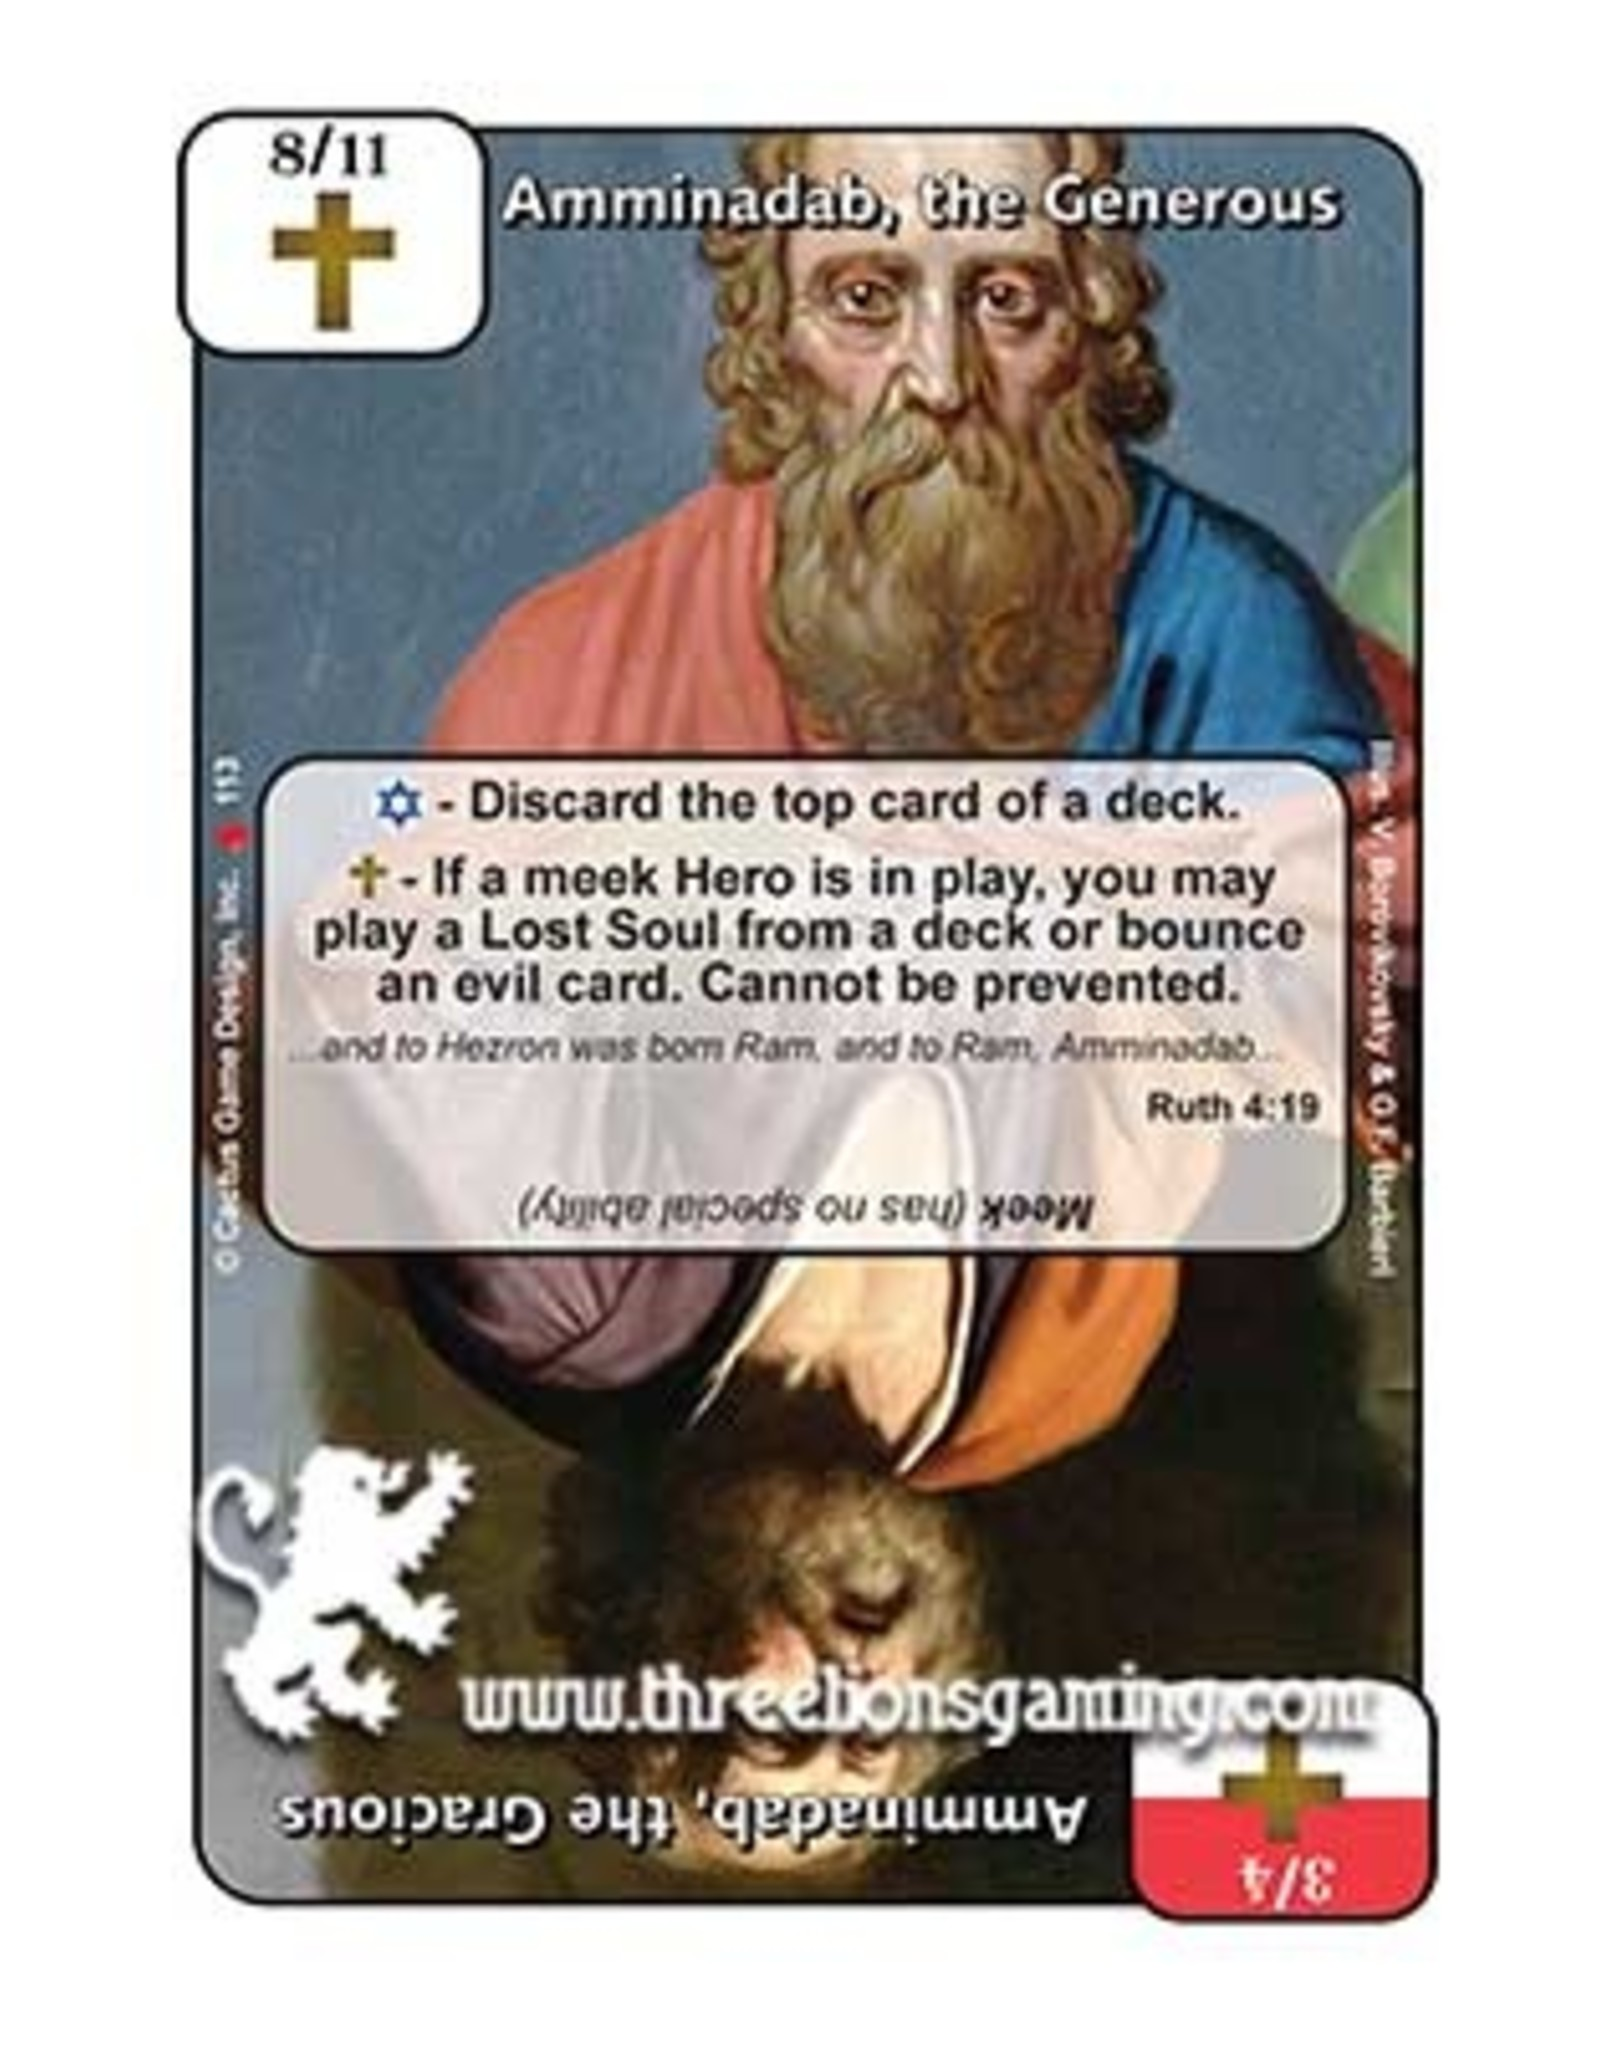 Amminadab, the Generous / Amminadab, the Gracious (LoC)